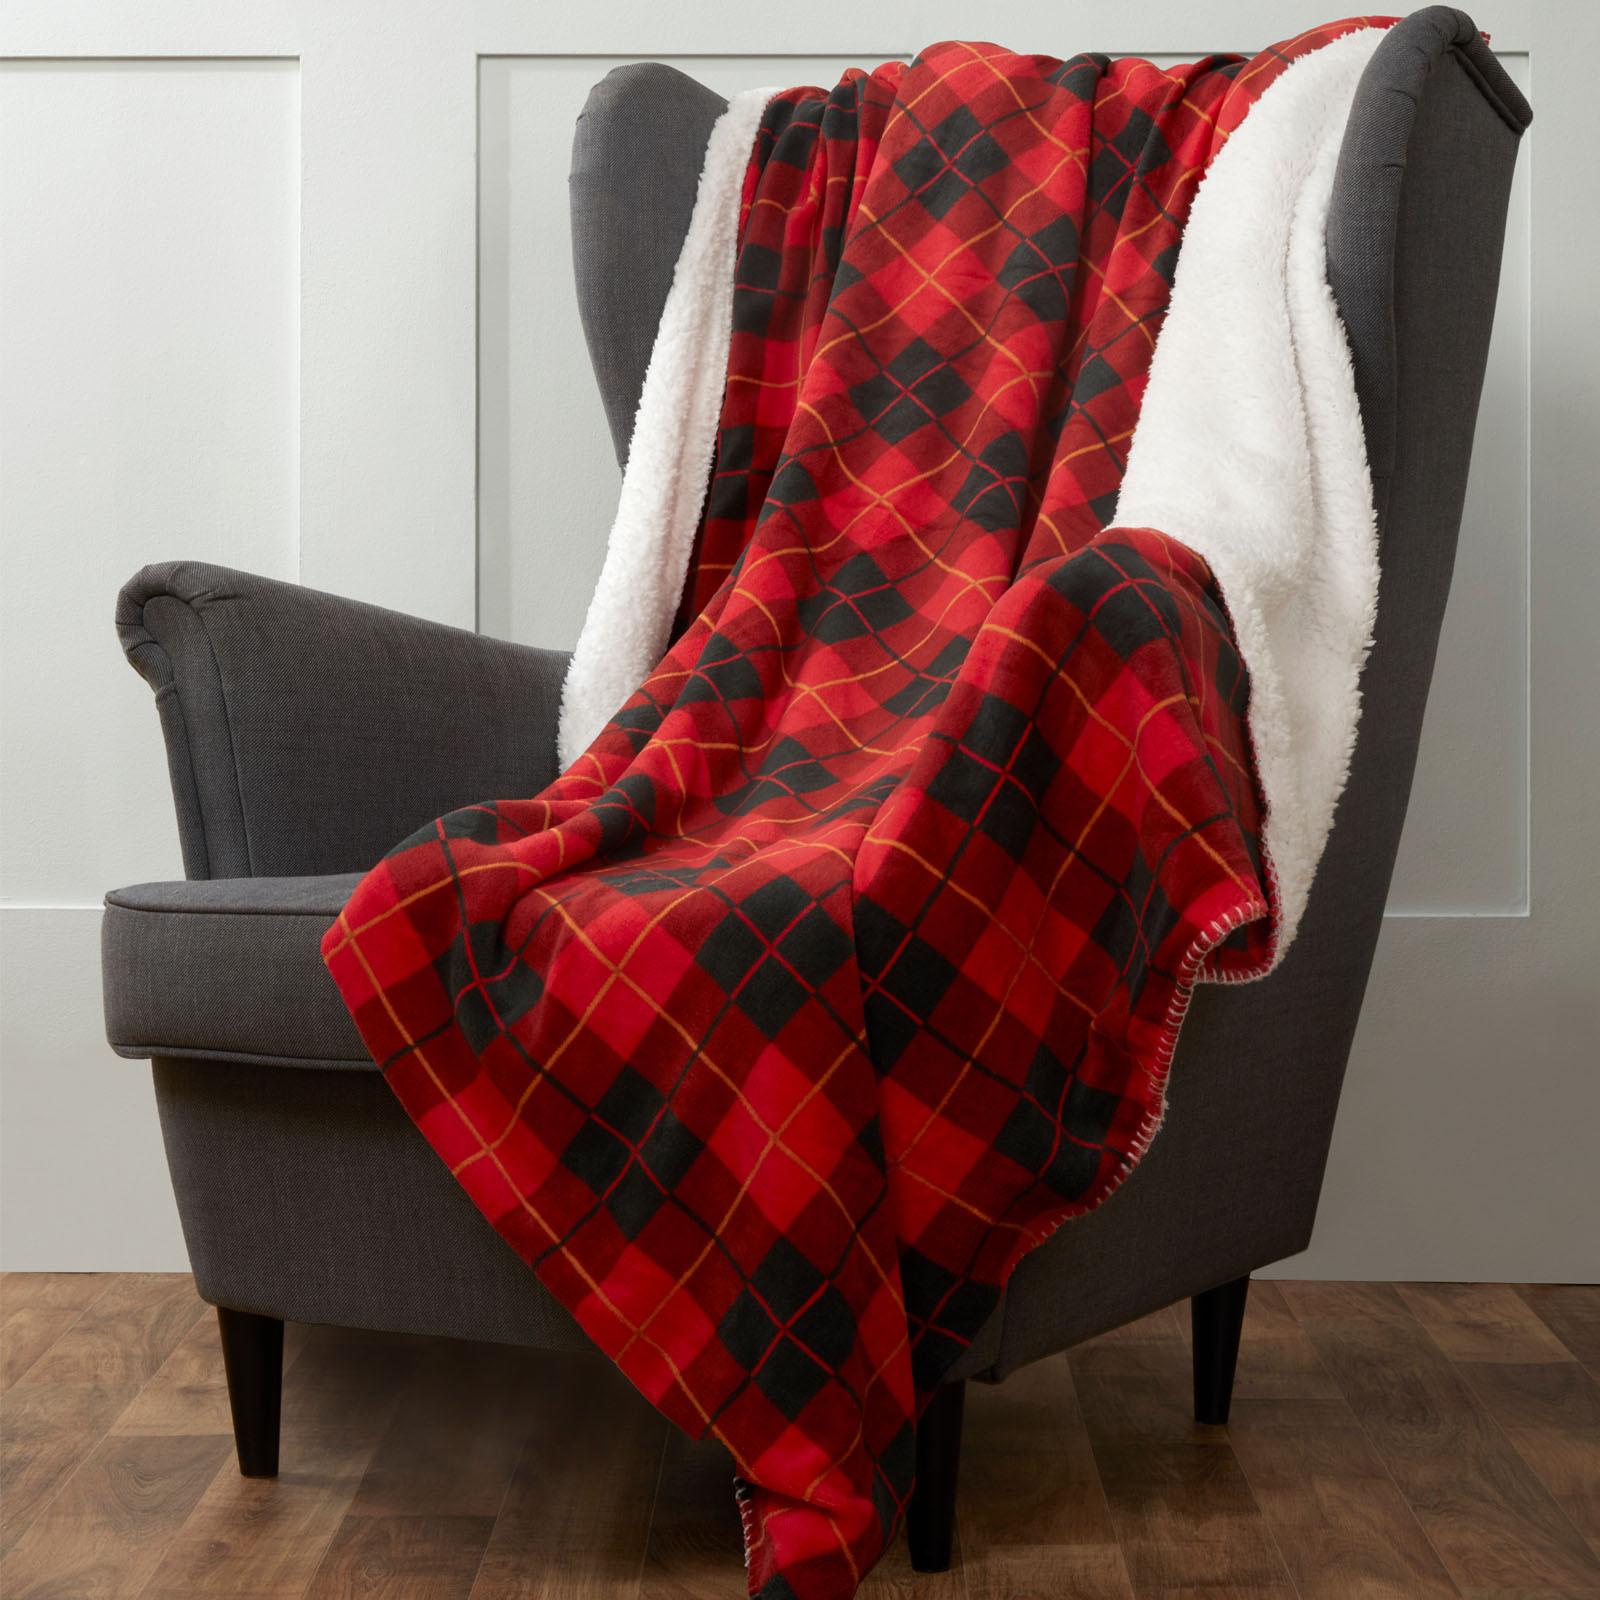 Dream scene Large Tartan Sherpa Flannel Fleece Blanket Check Red 150x180cm £8.99 @ Online Home Shop (£1.99 P&P)